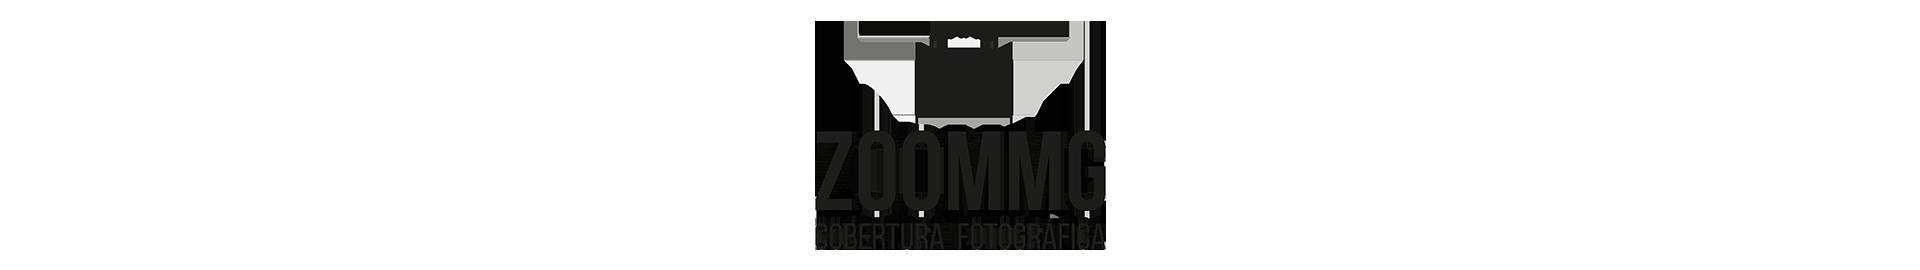 Contate ZOOMMG Cobertura Fotográfica